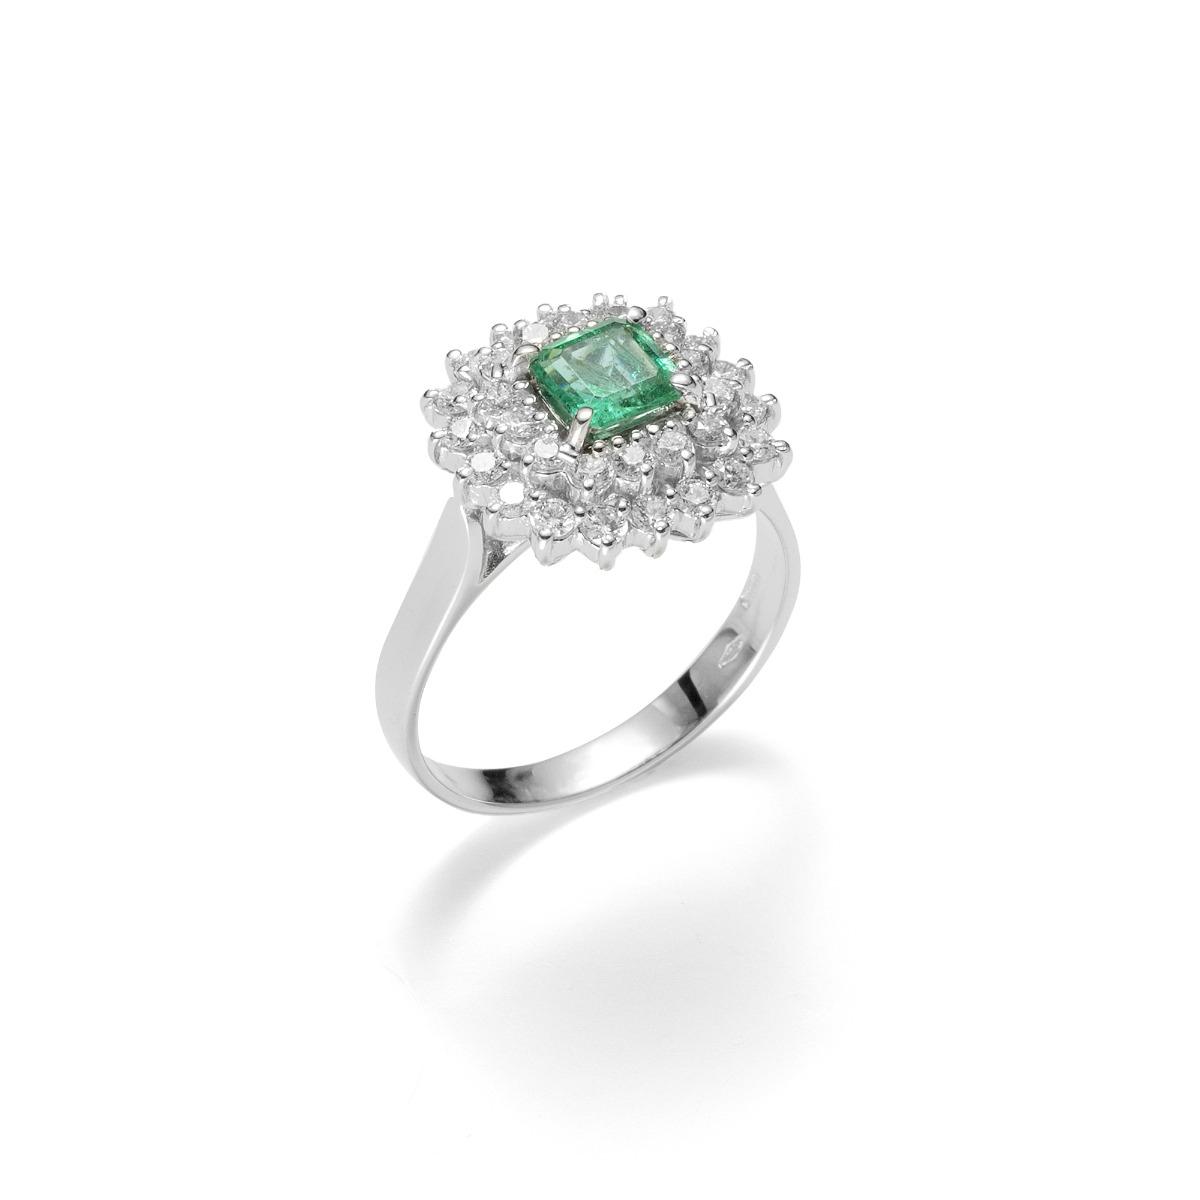 Halo Emerald Ring